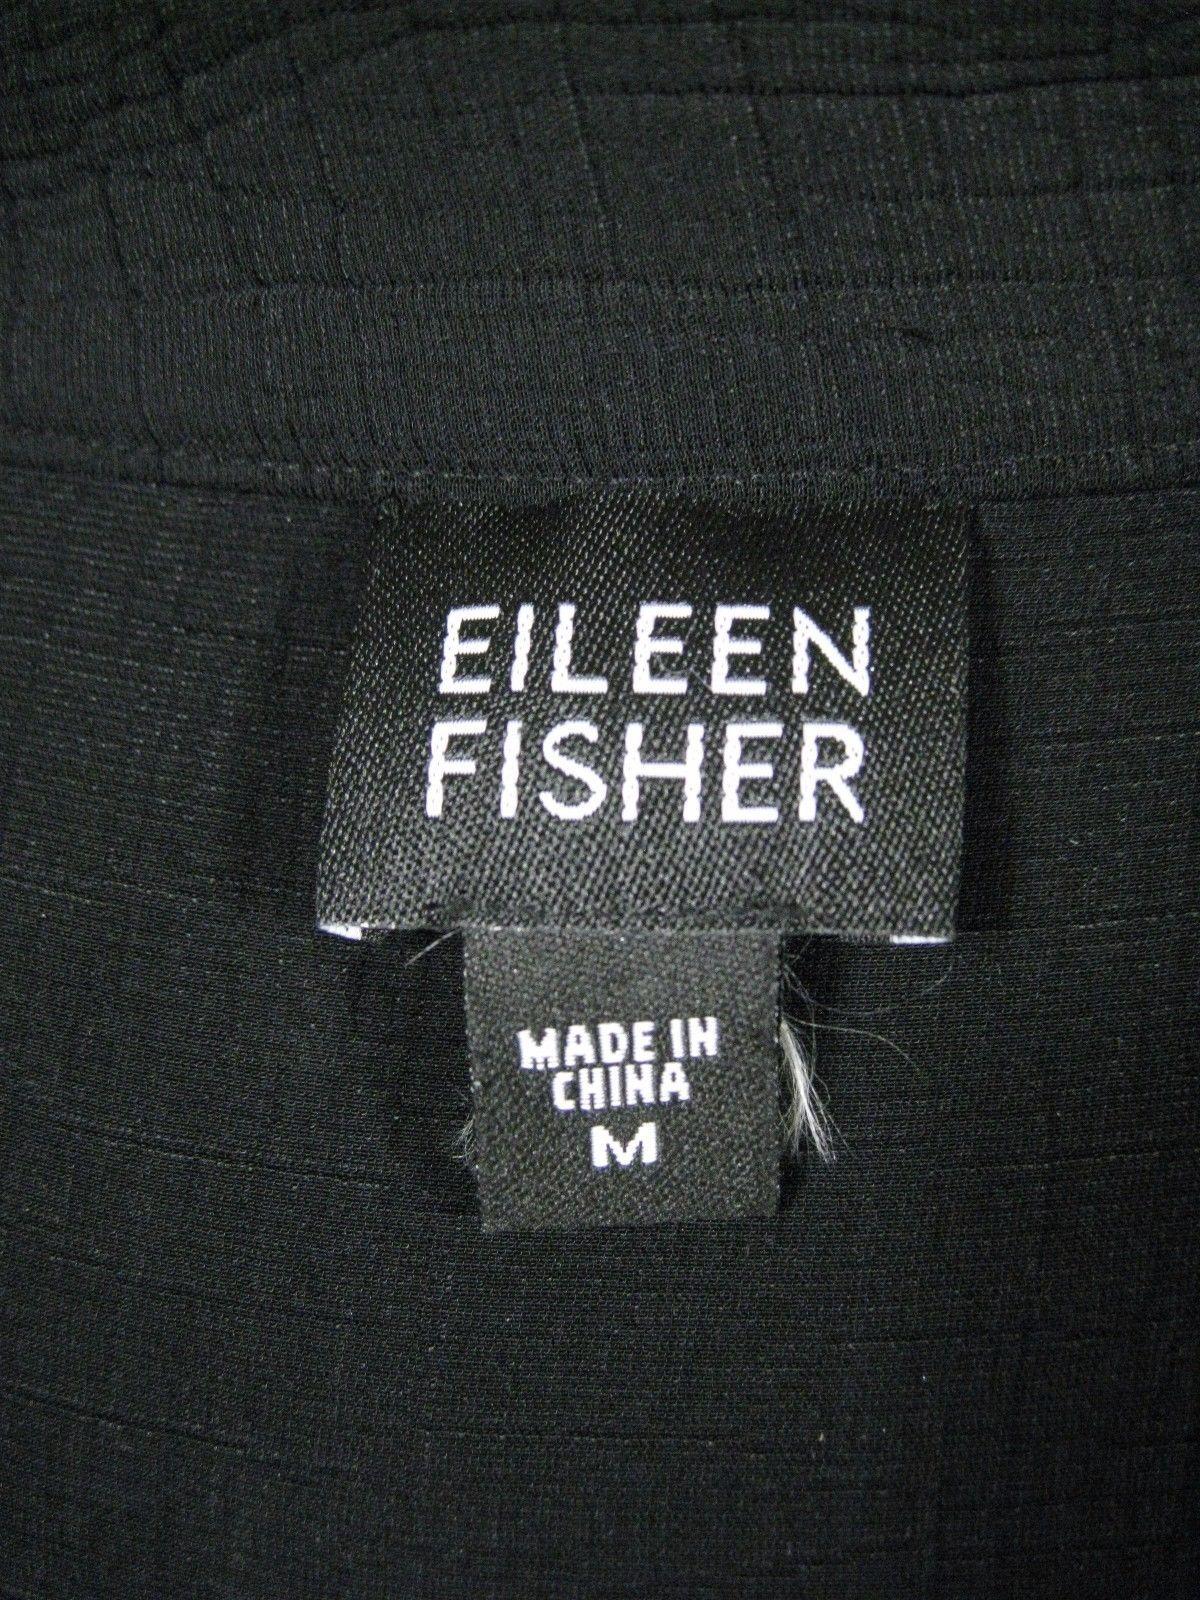 Eileen Fisher Women's Blazer Jacket Size M Hook Front Textured Rayon Black Flare